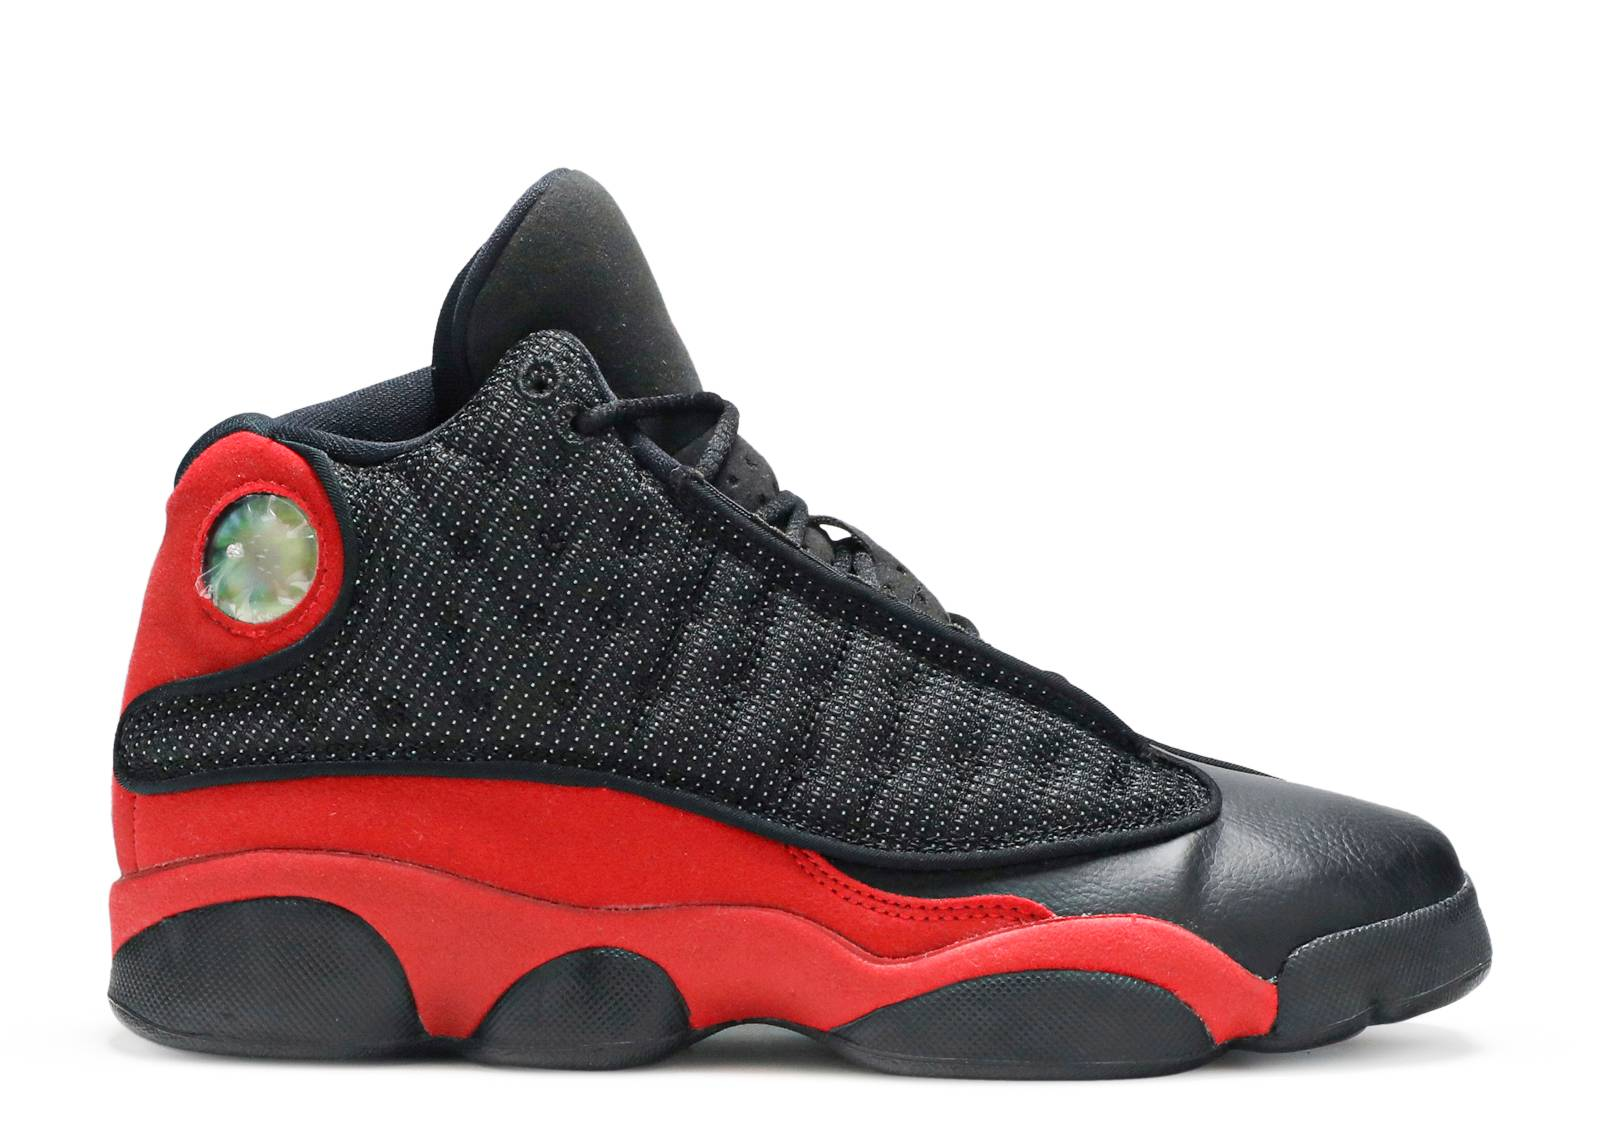 29848acf38d7af Air Jordan 13 (XIII) Shoes - Nike